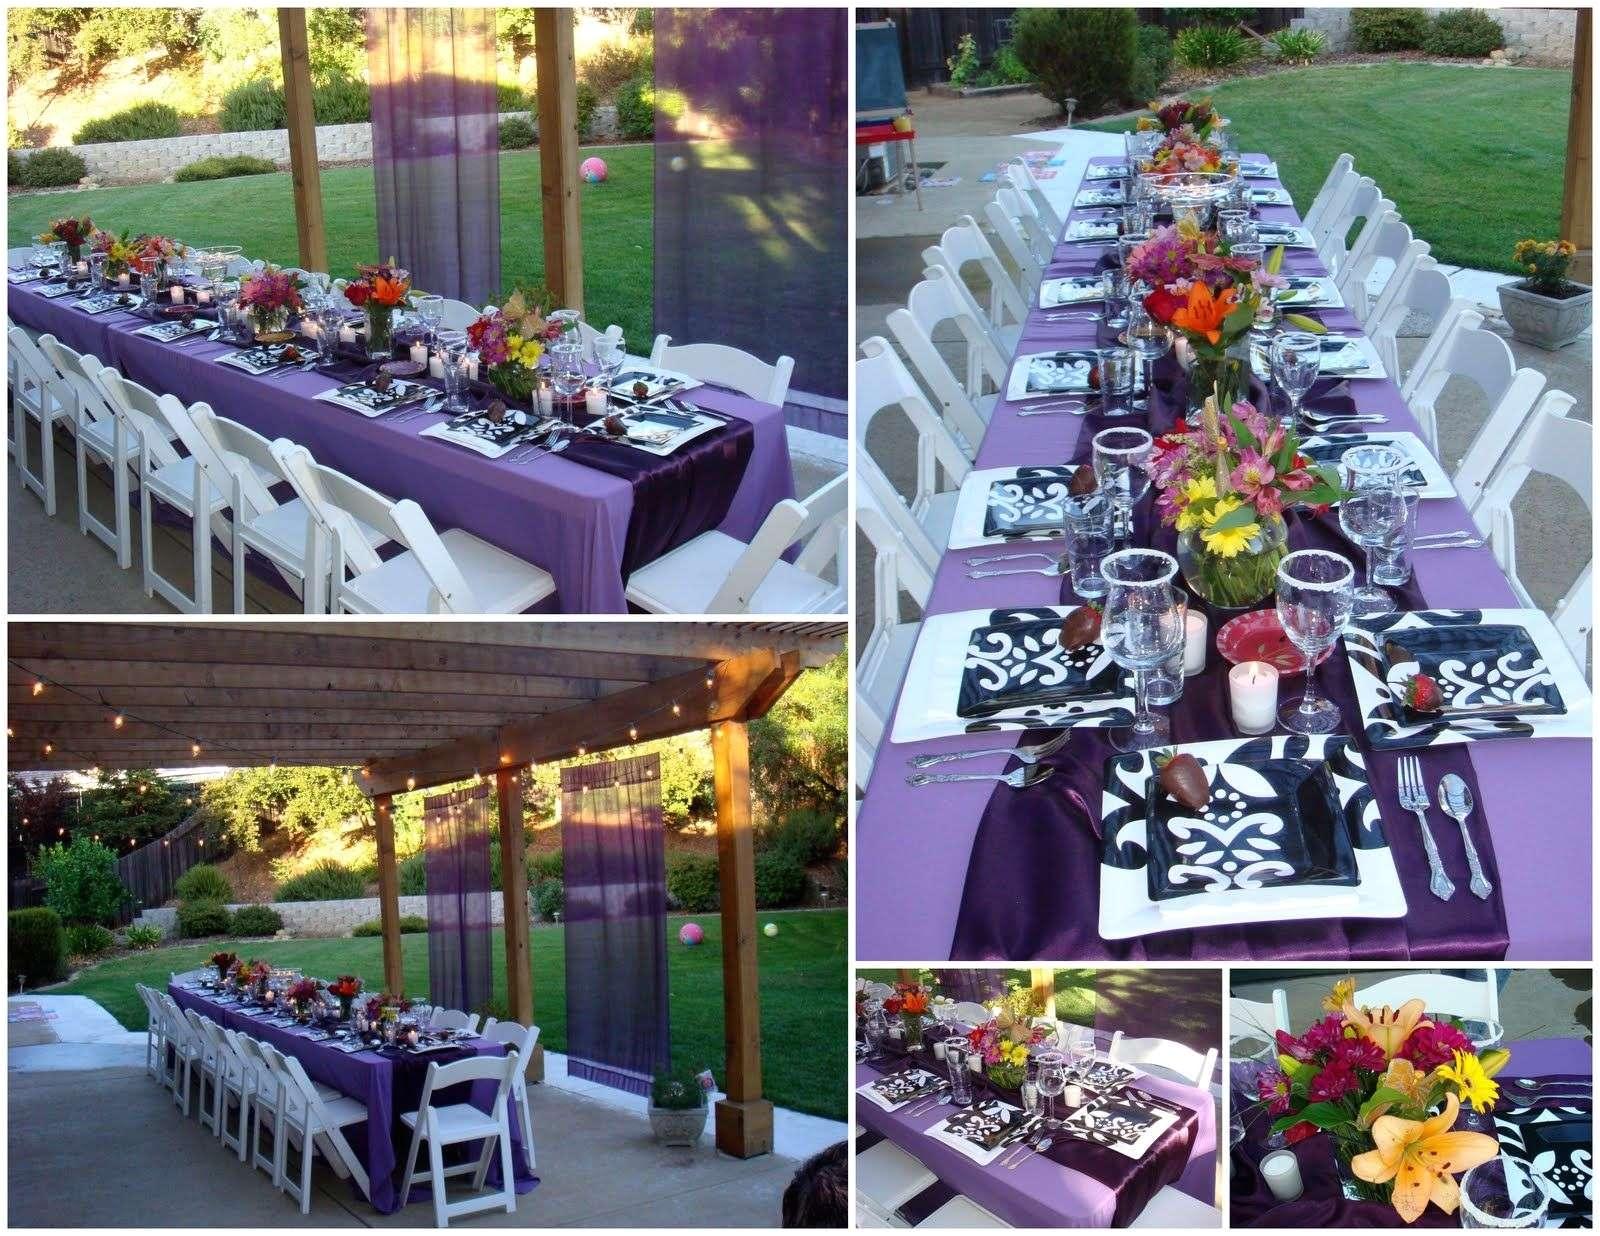 backyard kegger party beautiful high school graduation party ideas